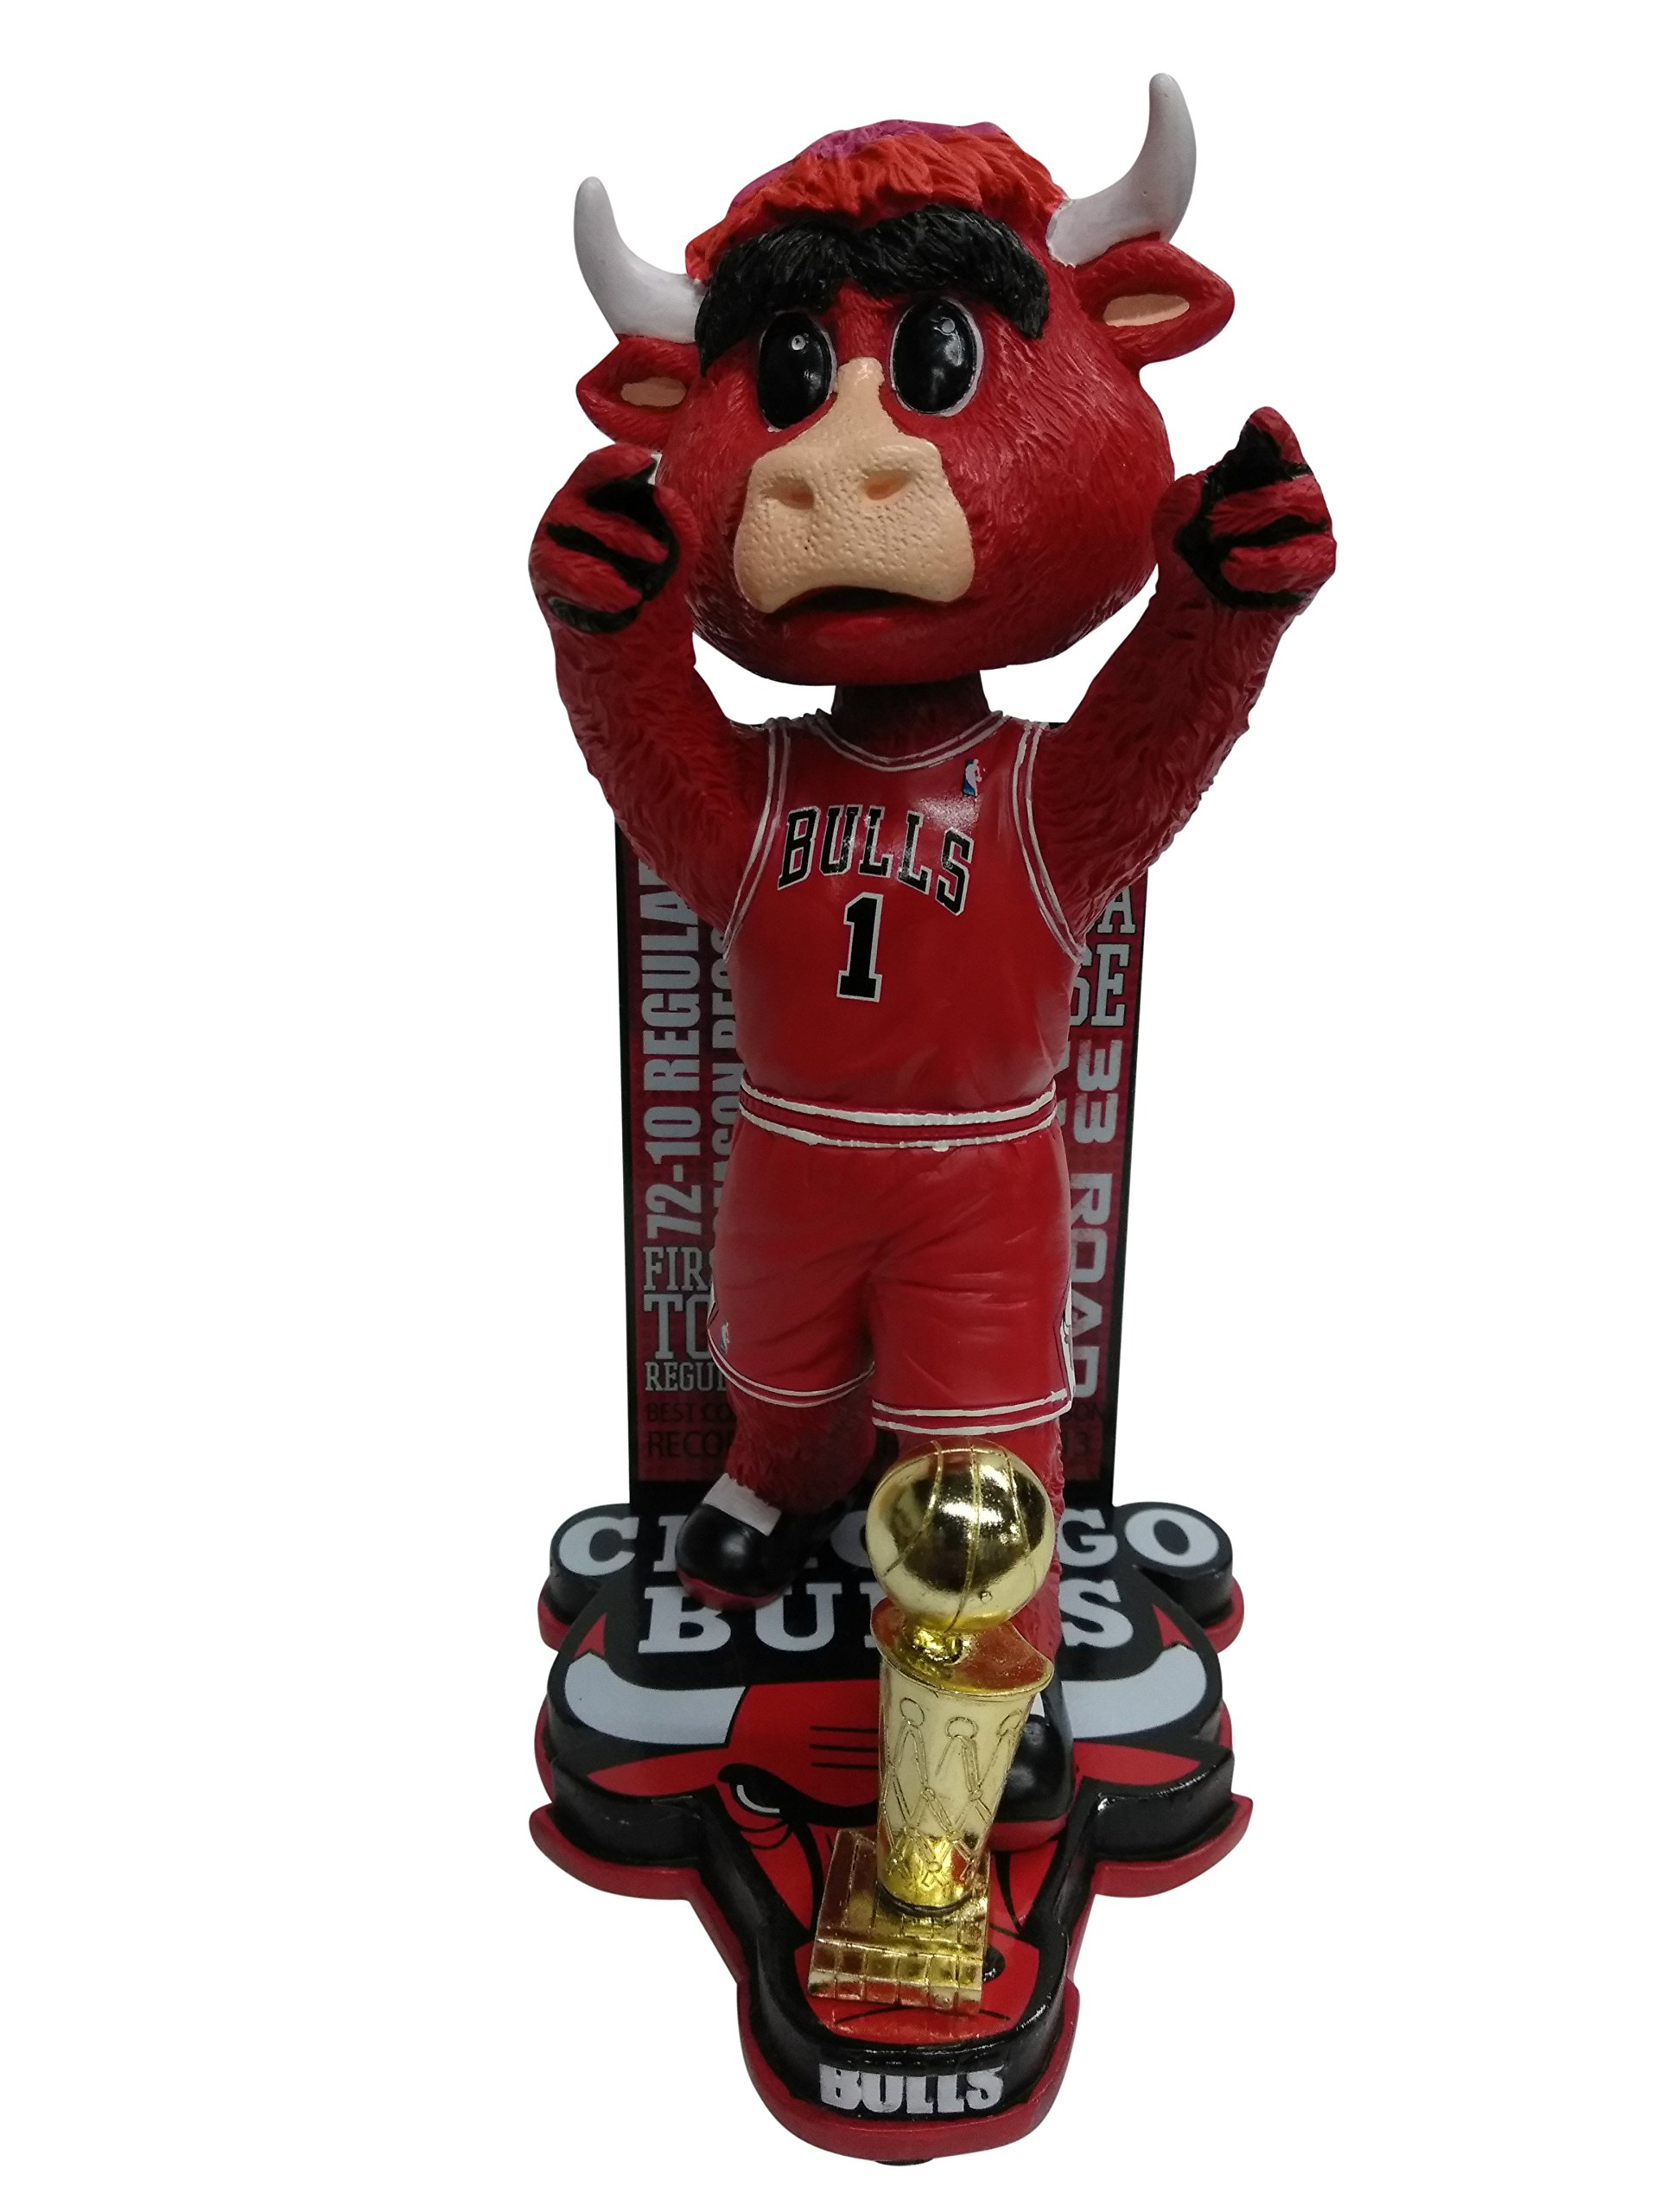 Benny the Bull Chicago Bulls NBA Greatest Season Bobblehead - Numbered to 216